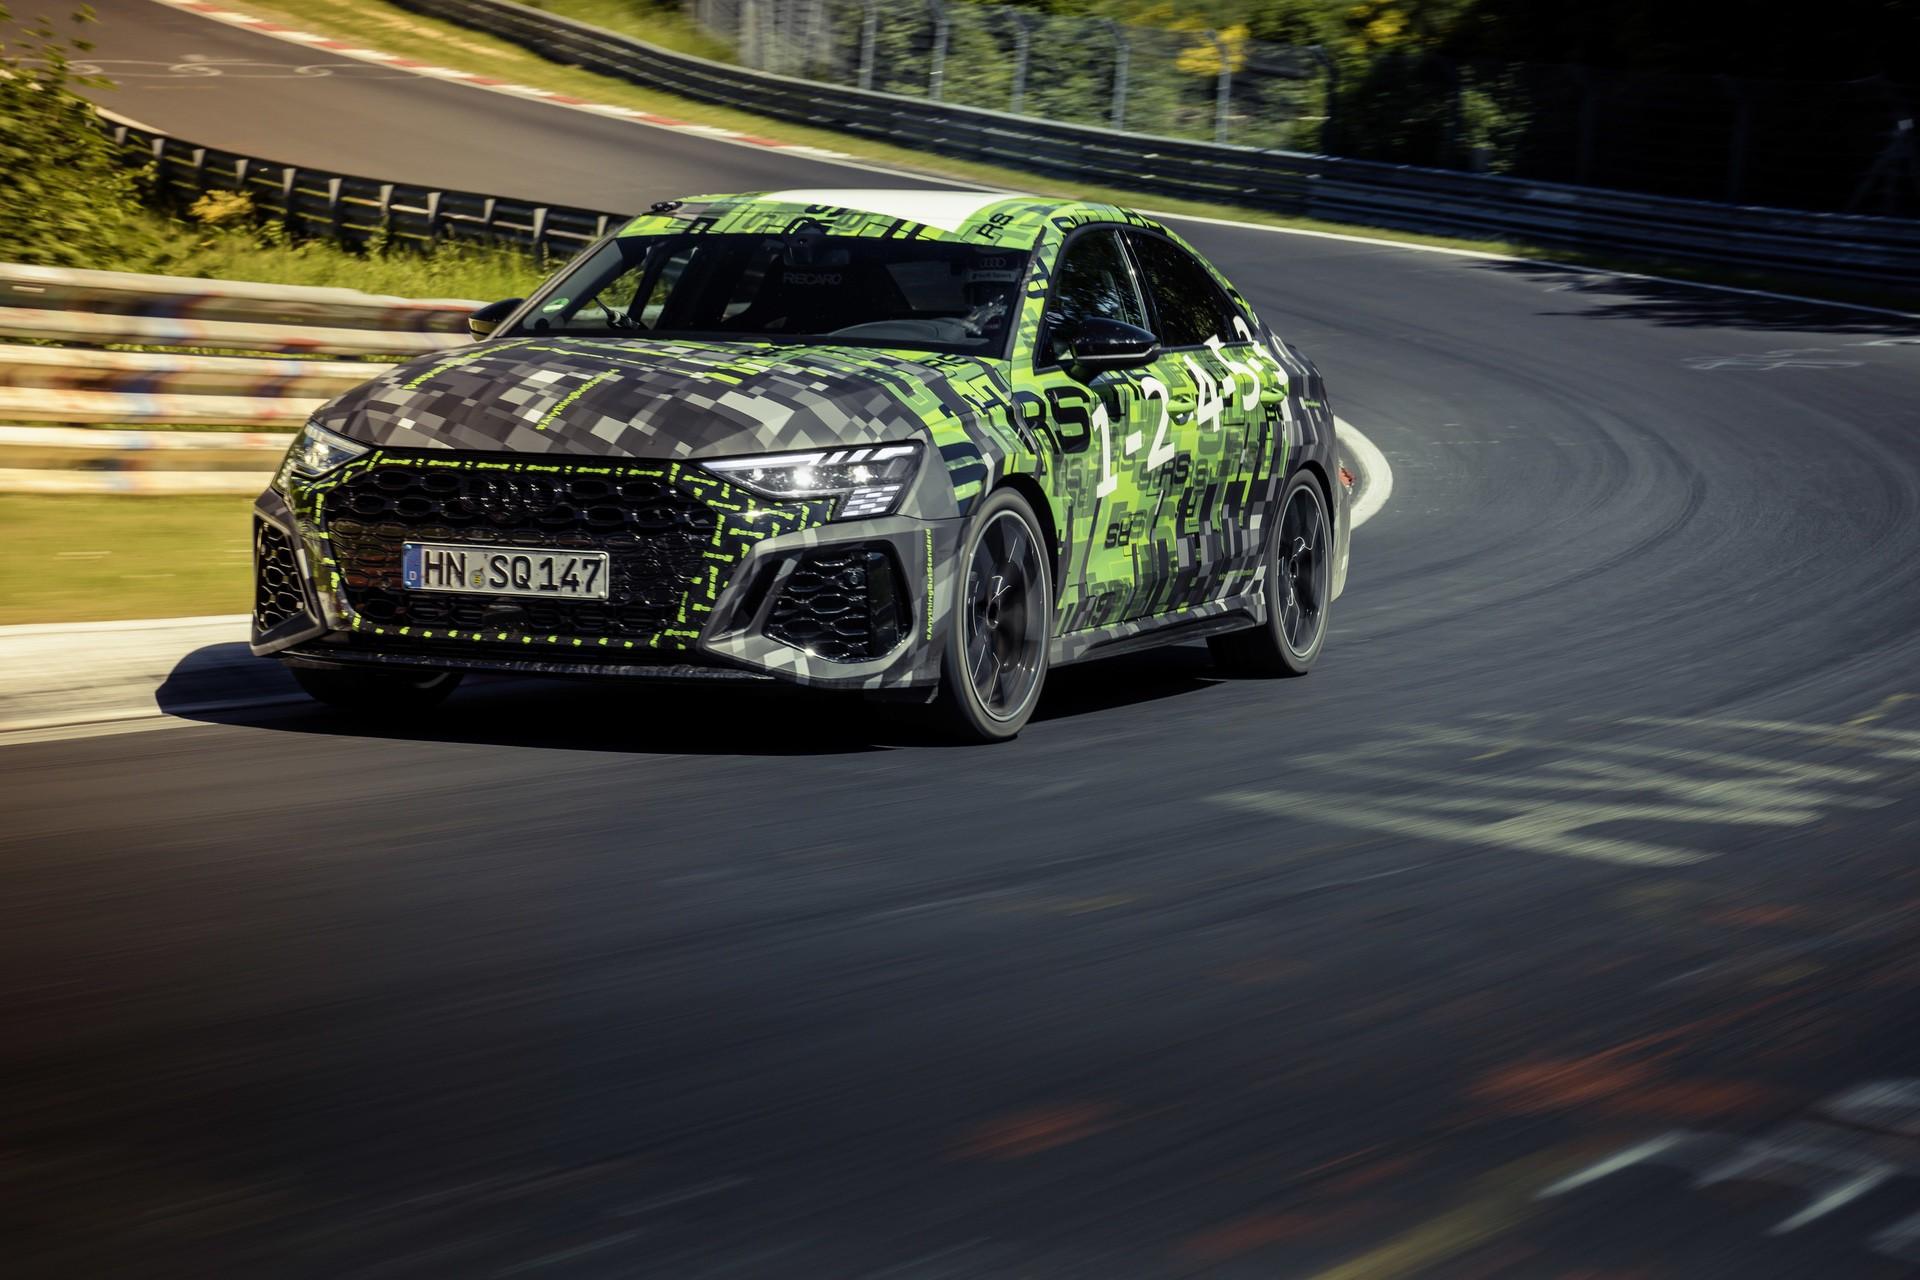 Audi_RS3_Sedan_Nurburgring_lap_record-0005